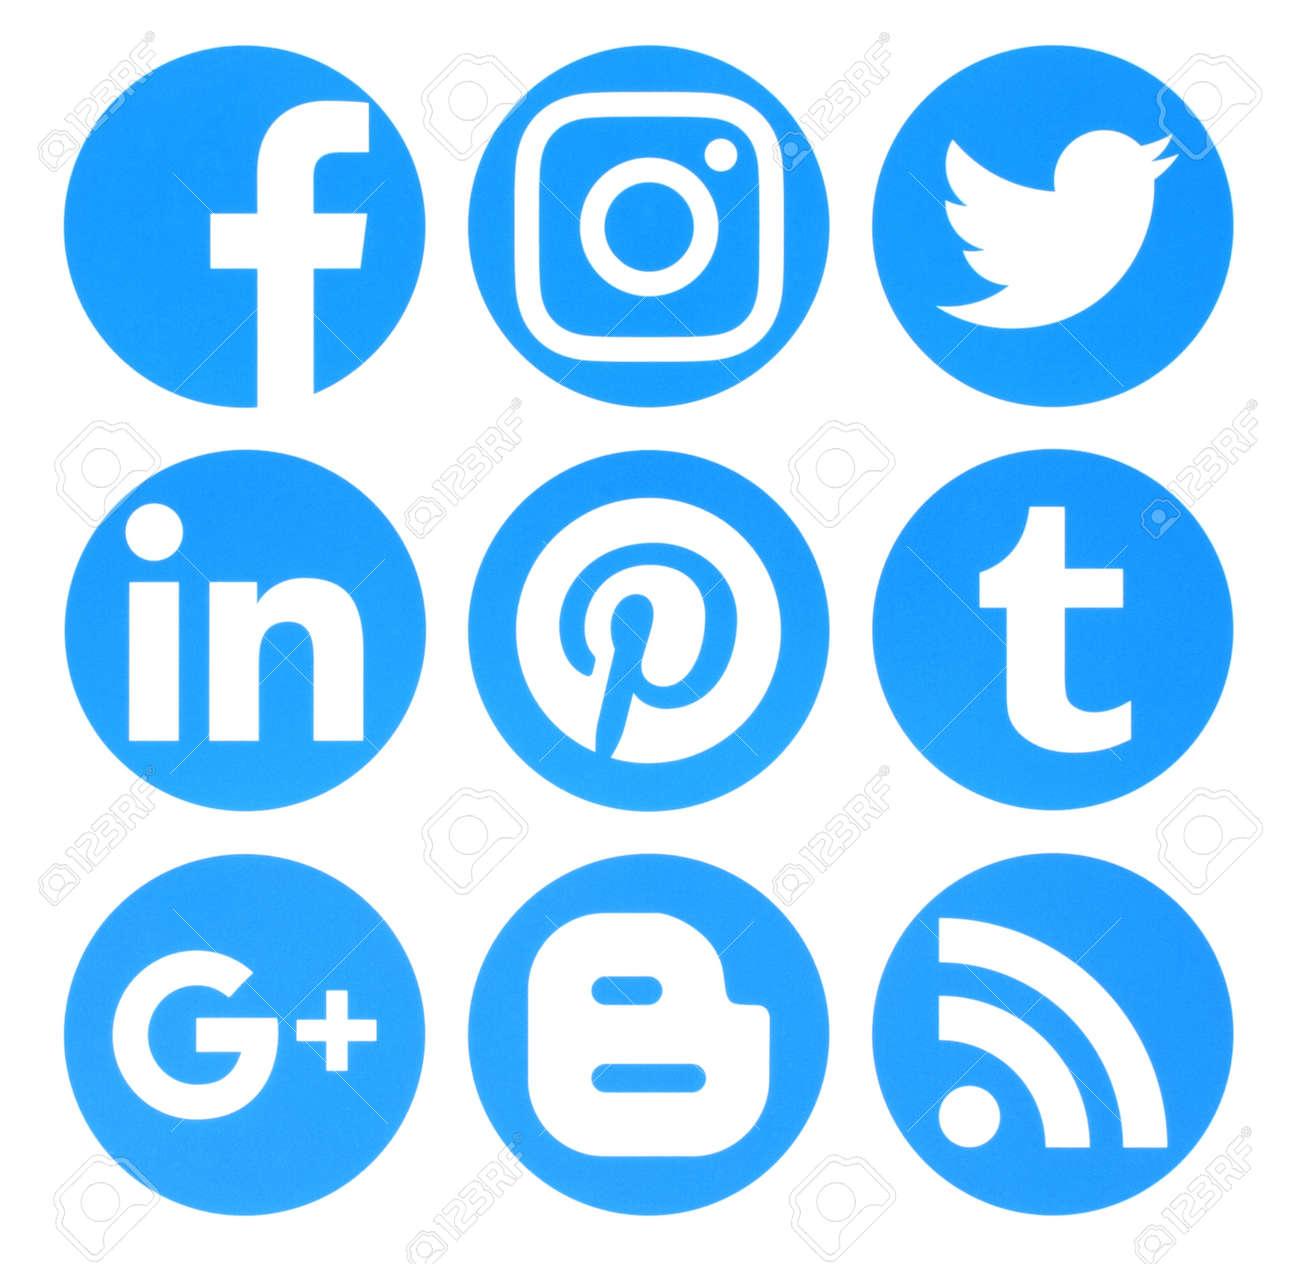 Kiev, Ukraine - August 22, 2016: Collection of popular circle blue social media logos printed on paper:Facebook, Twitter, Google Plus, Instagram, Pinterest, LinkedIn, Blogger, Tumblr and RSS - 62014208